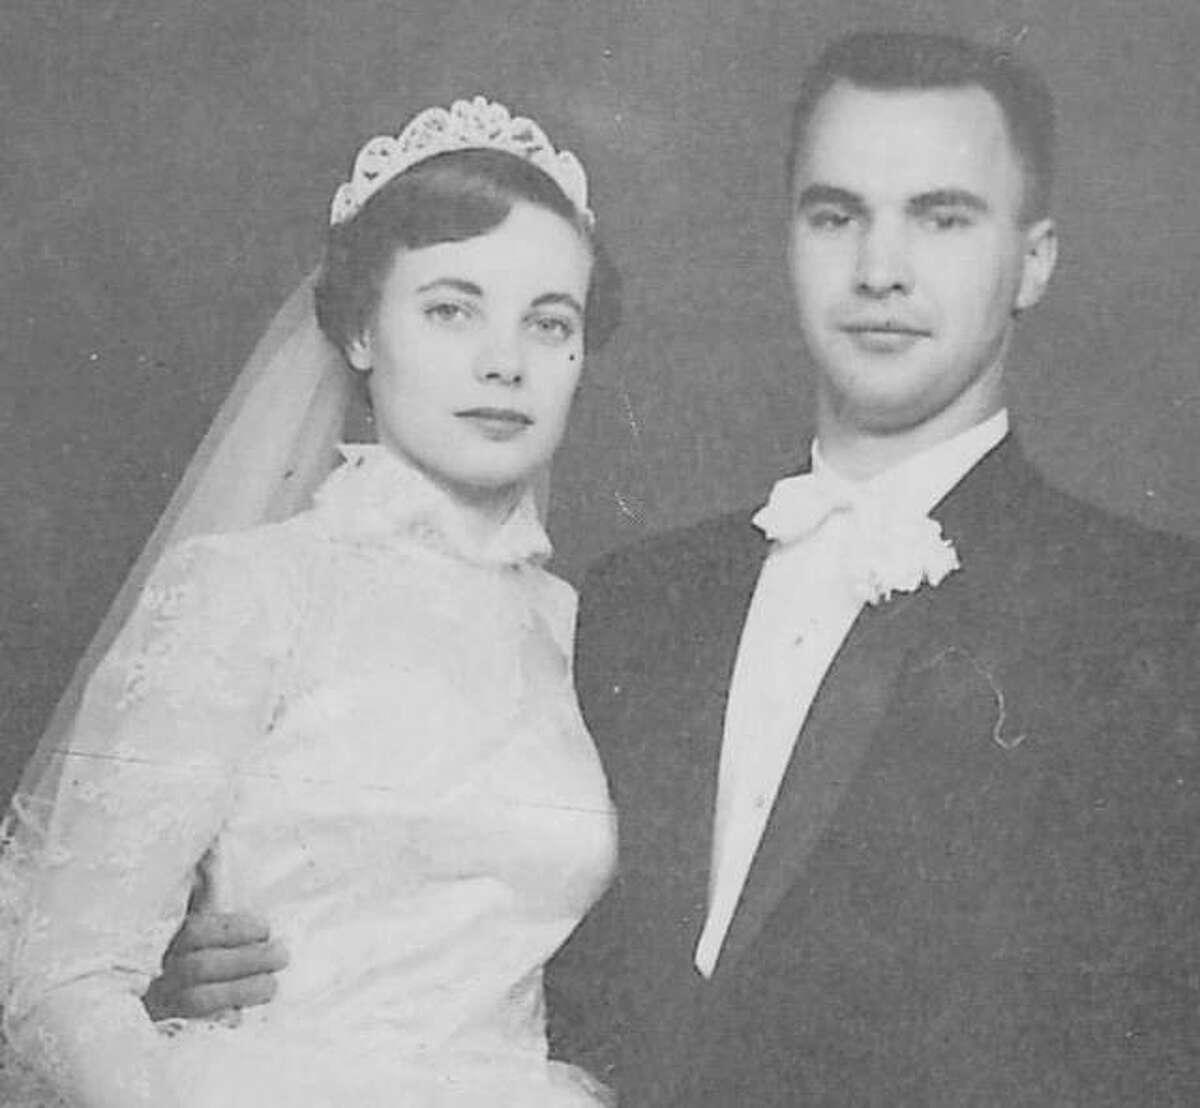 John and Eula Klockenkemper at their wedding